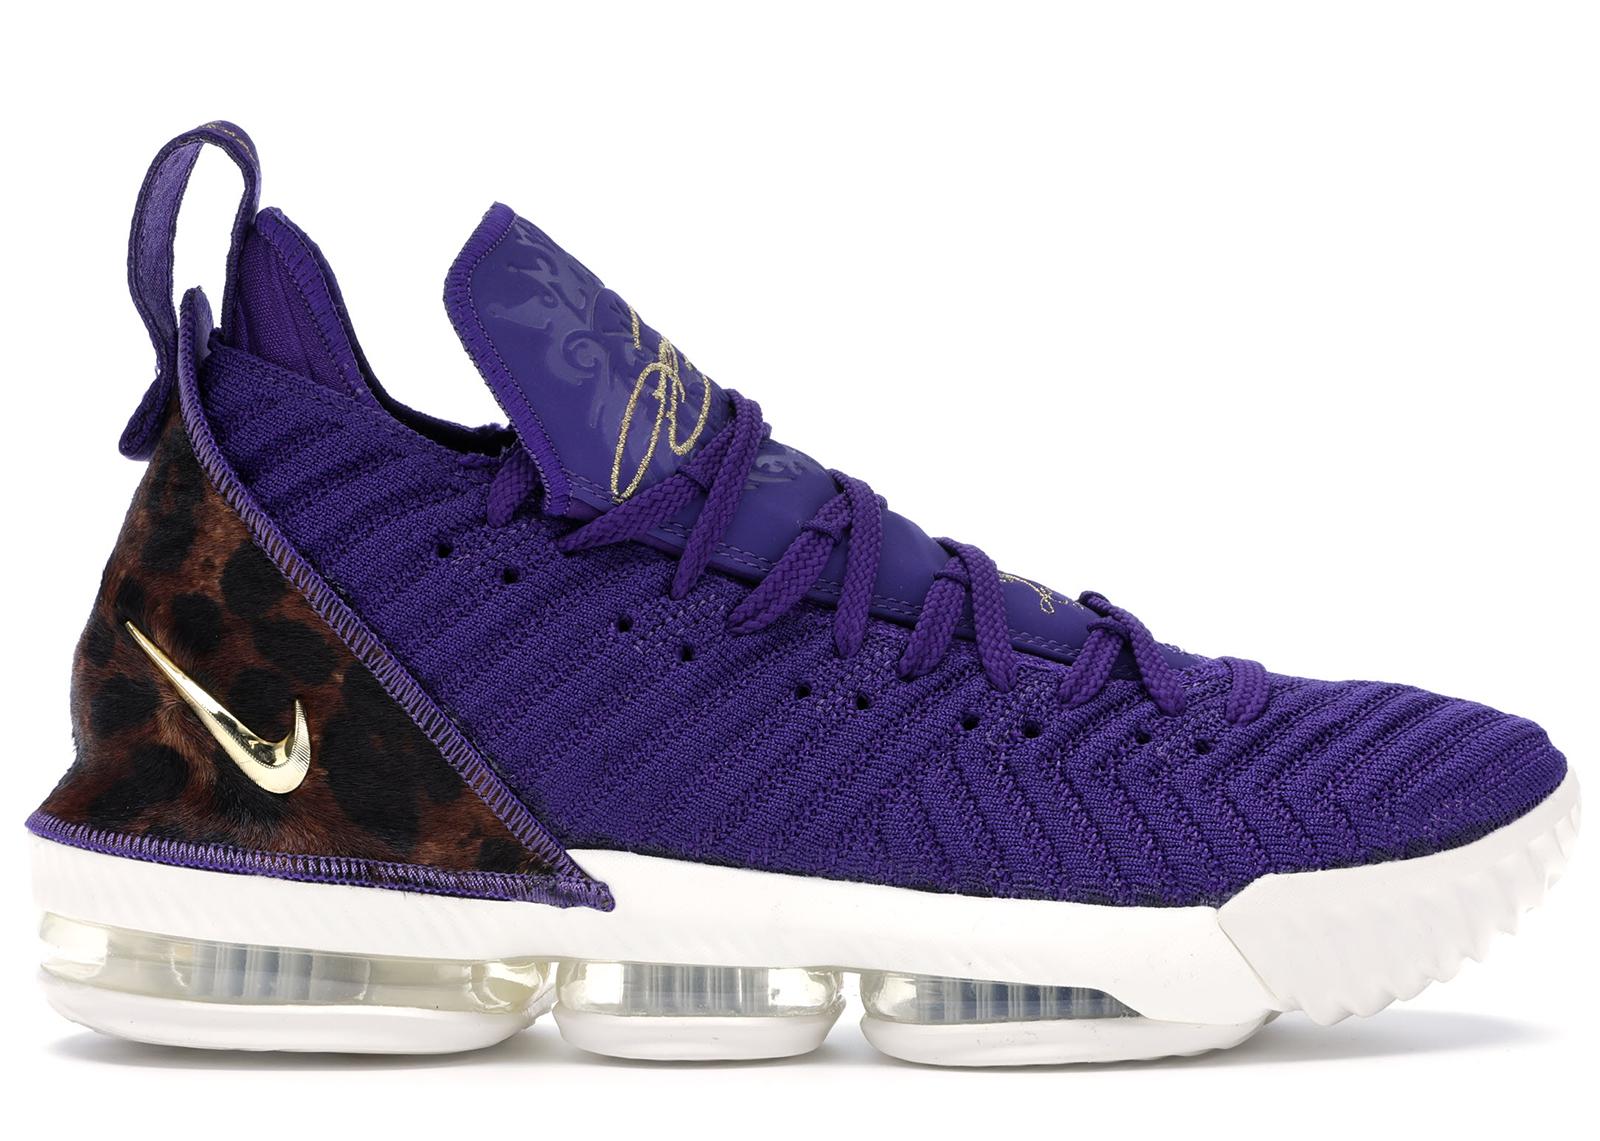 Nike LeBron 16 King Court Purple